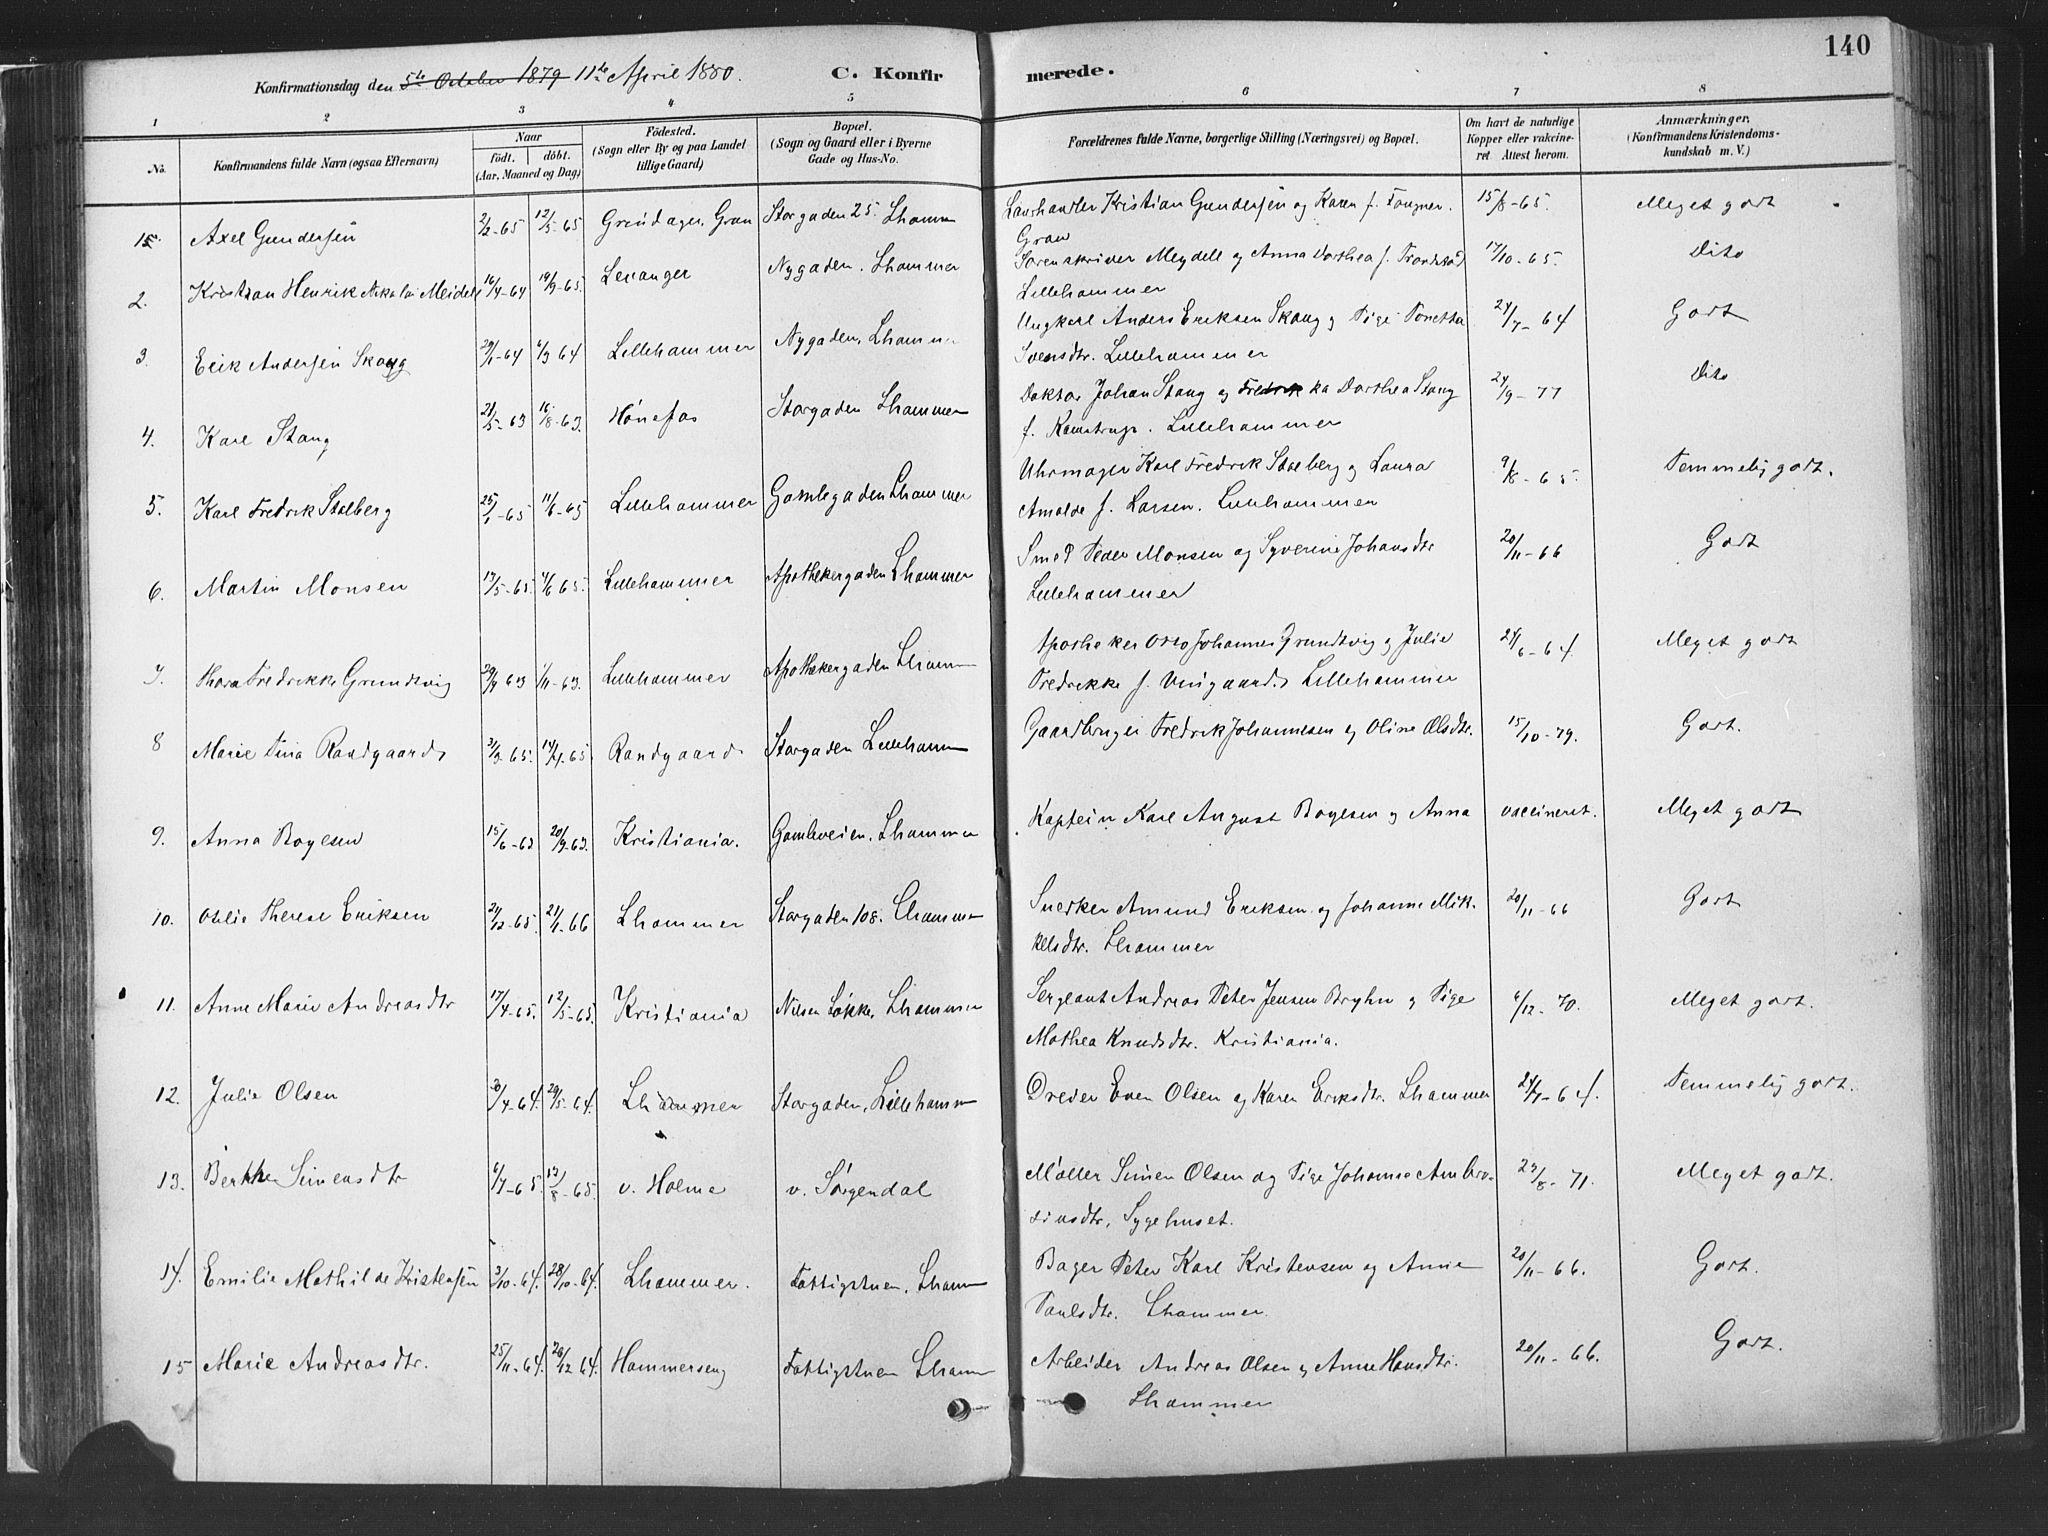 SAH, Fåberg prestekontor, H/Ha/Haa/L0010: Parish register (official) no. 10, 1879-1900, p. 140